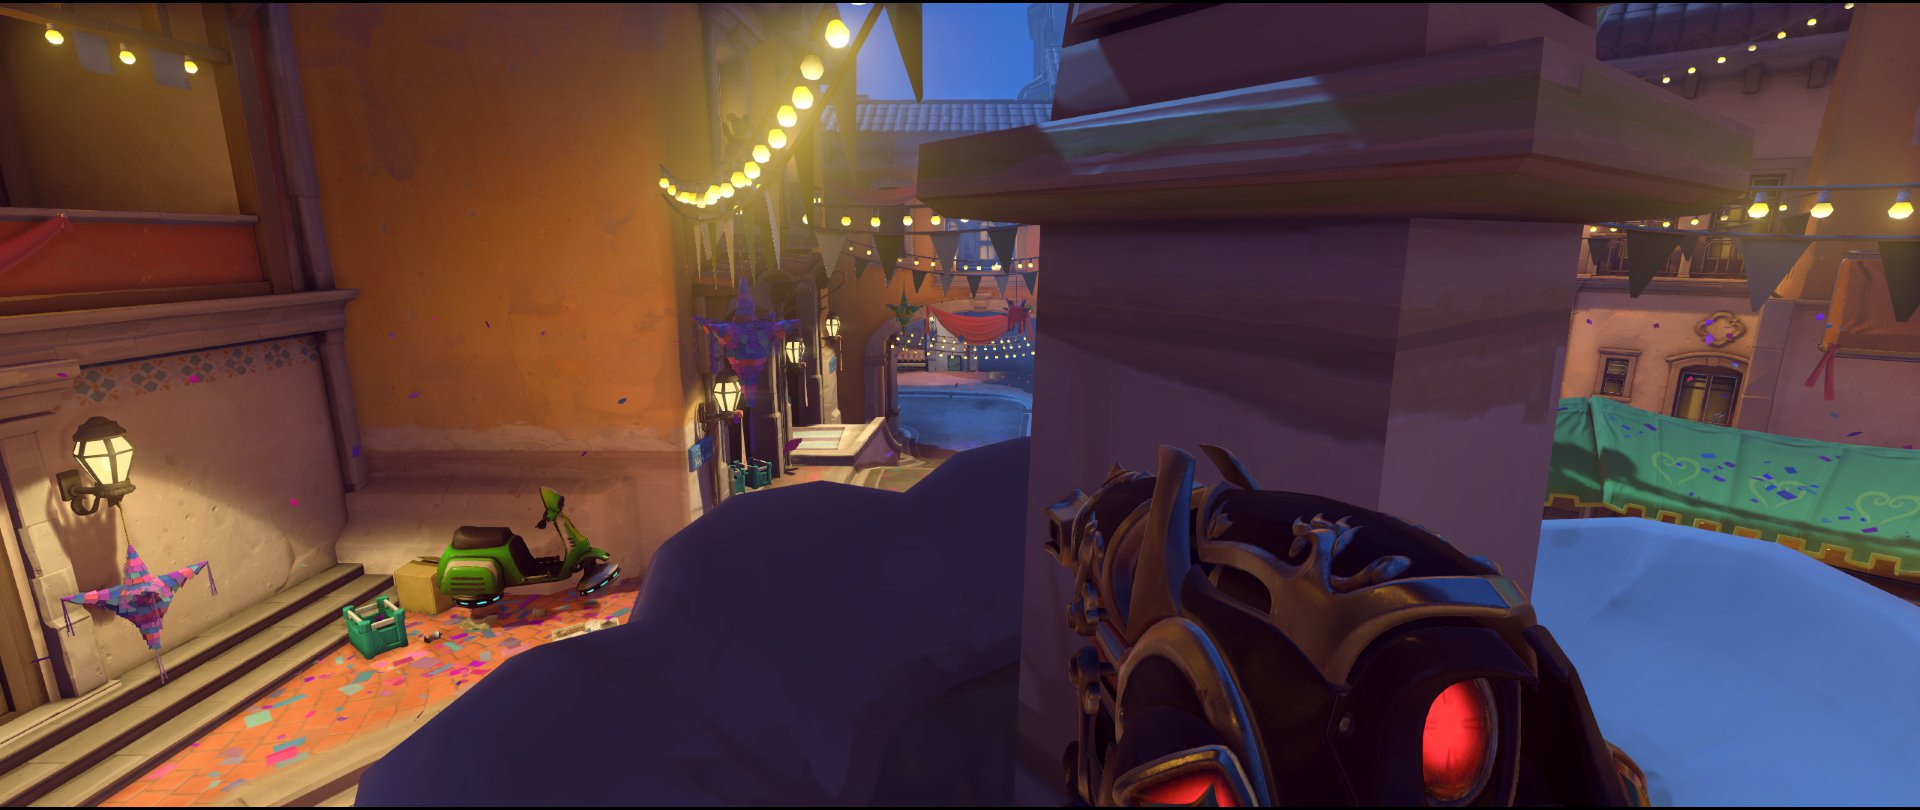 Statue market defense sniping spot Widowmaker Dorado.jpg